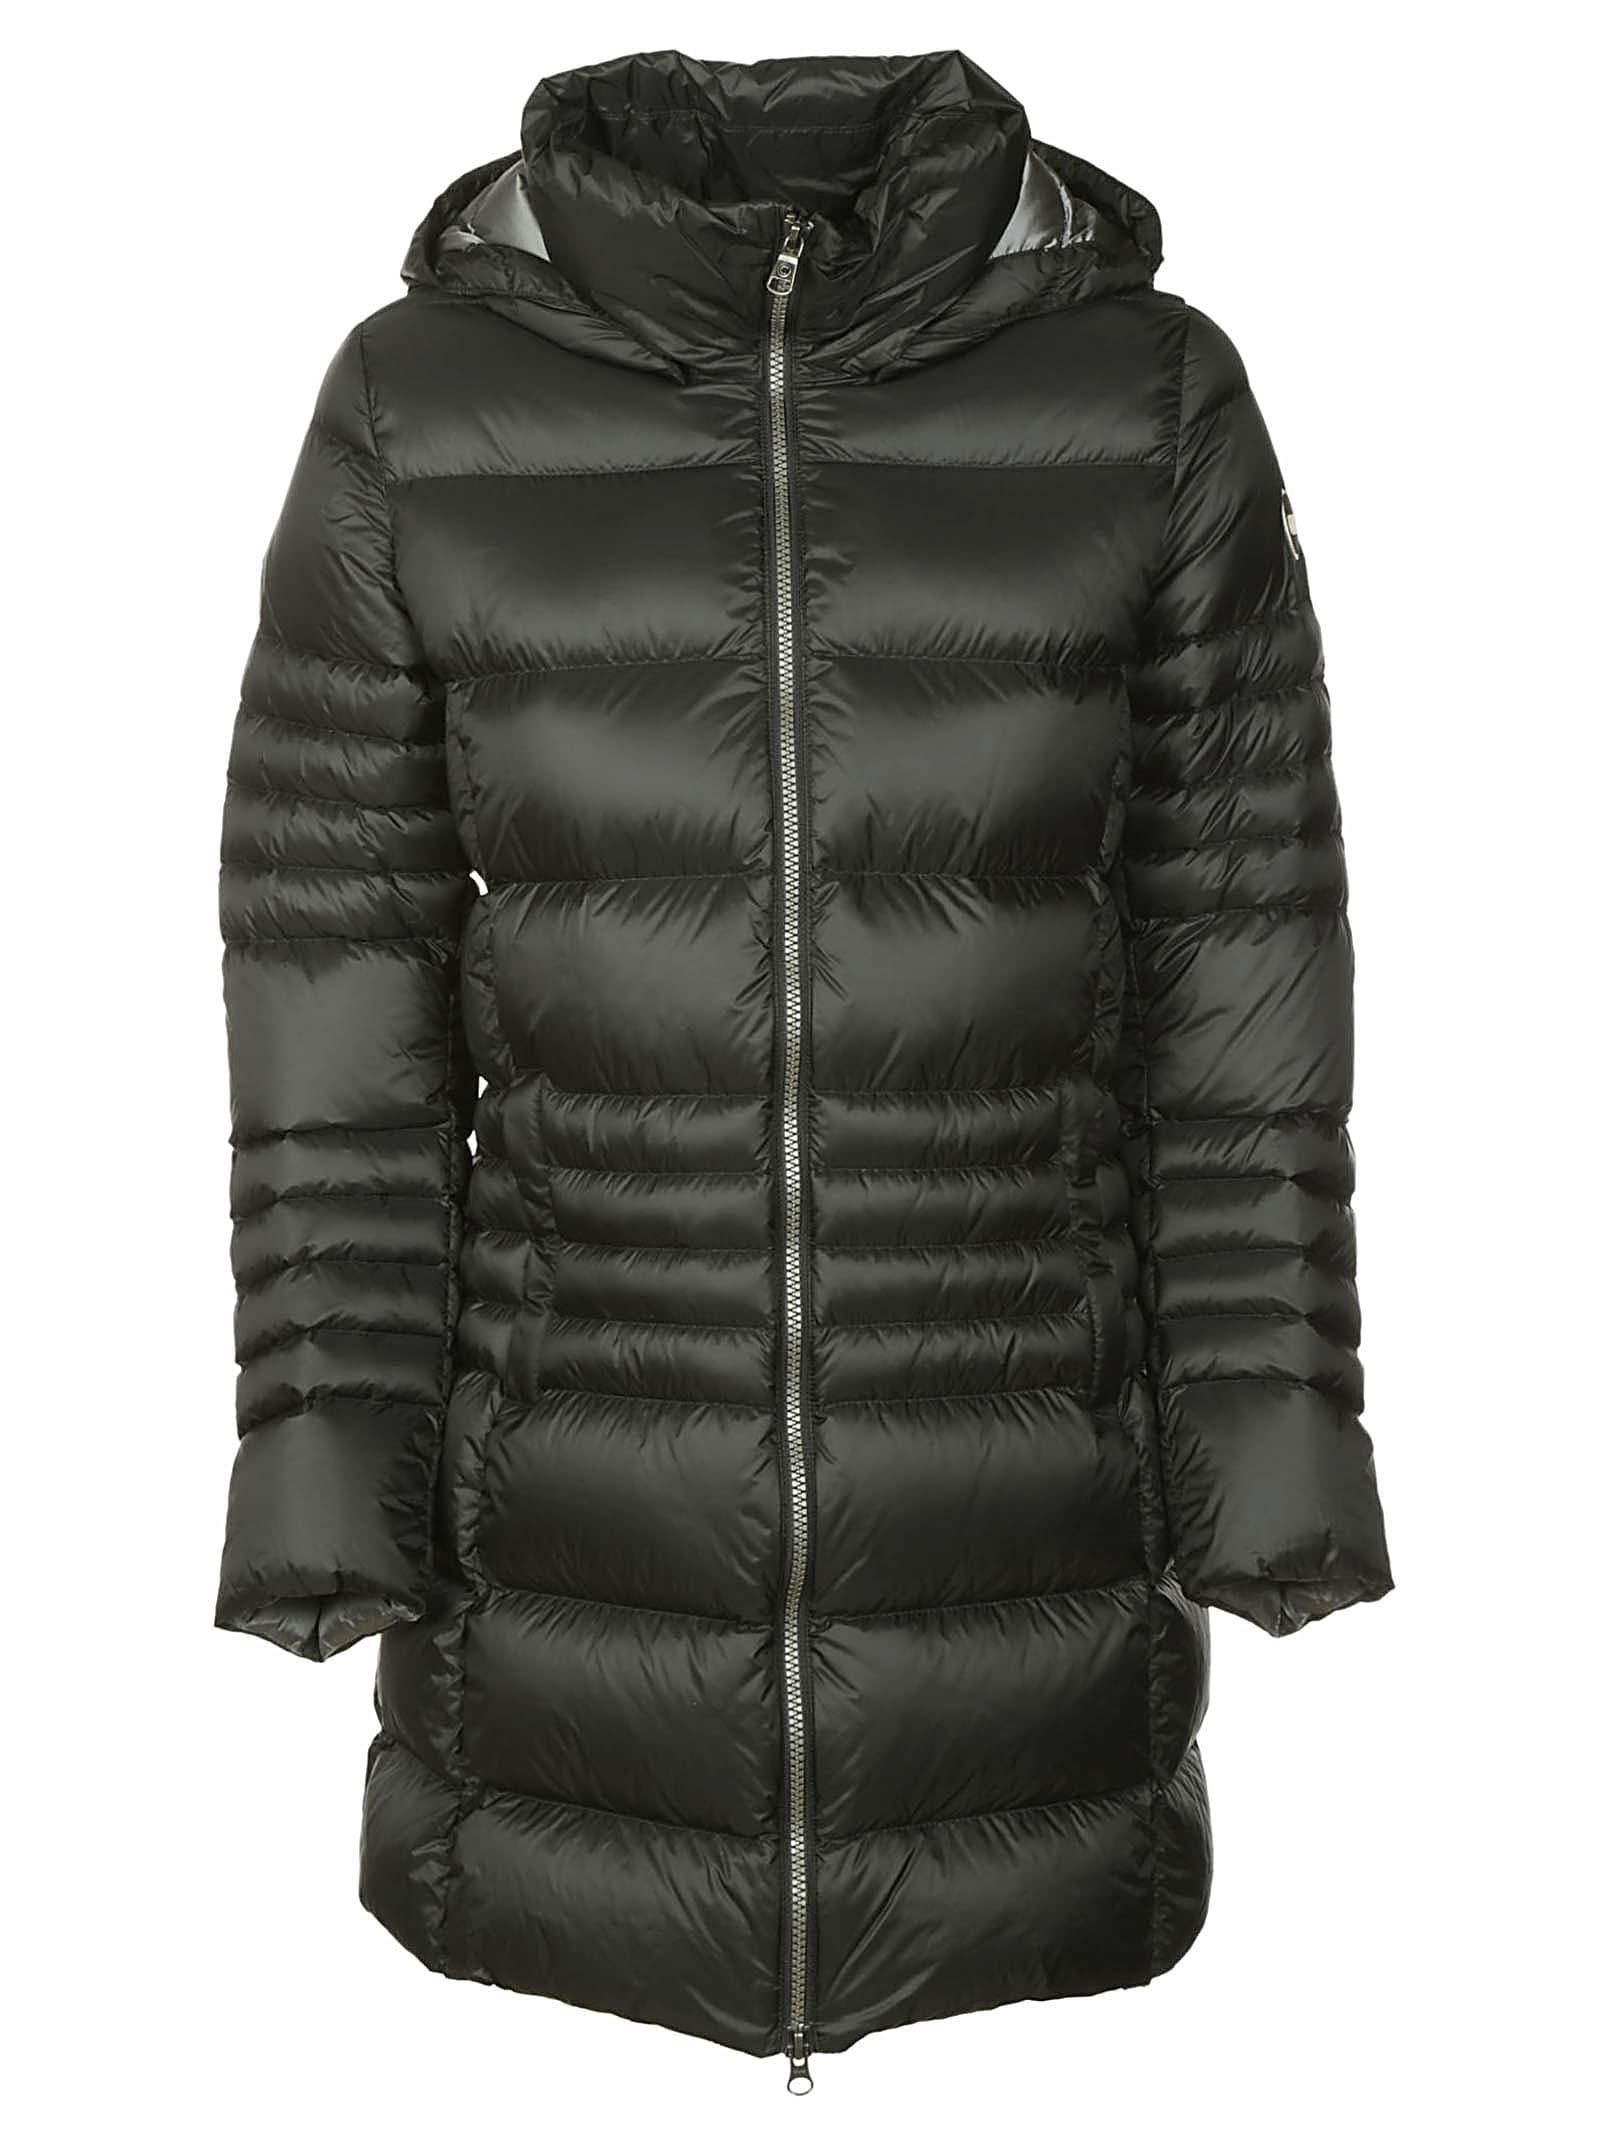 Photo of  Colmar Semi-padded Hooded Bomber- shop Colmar jackets online sales